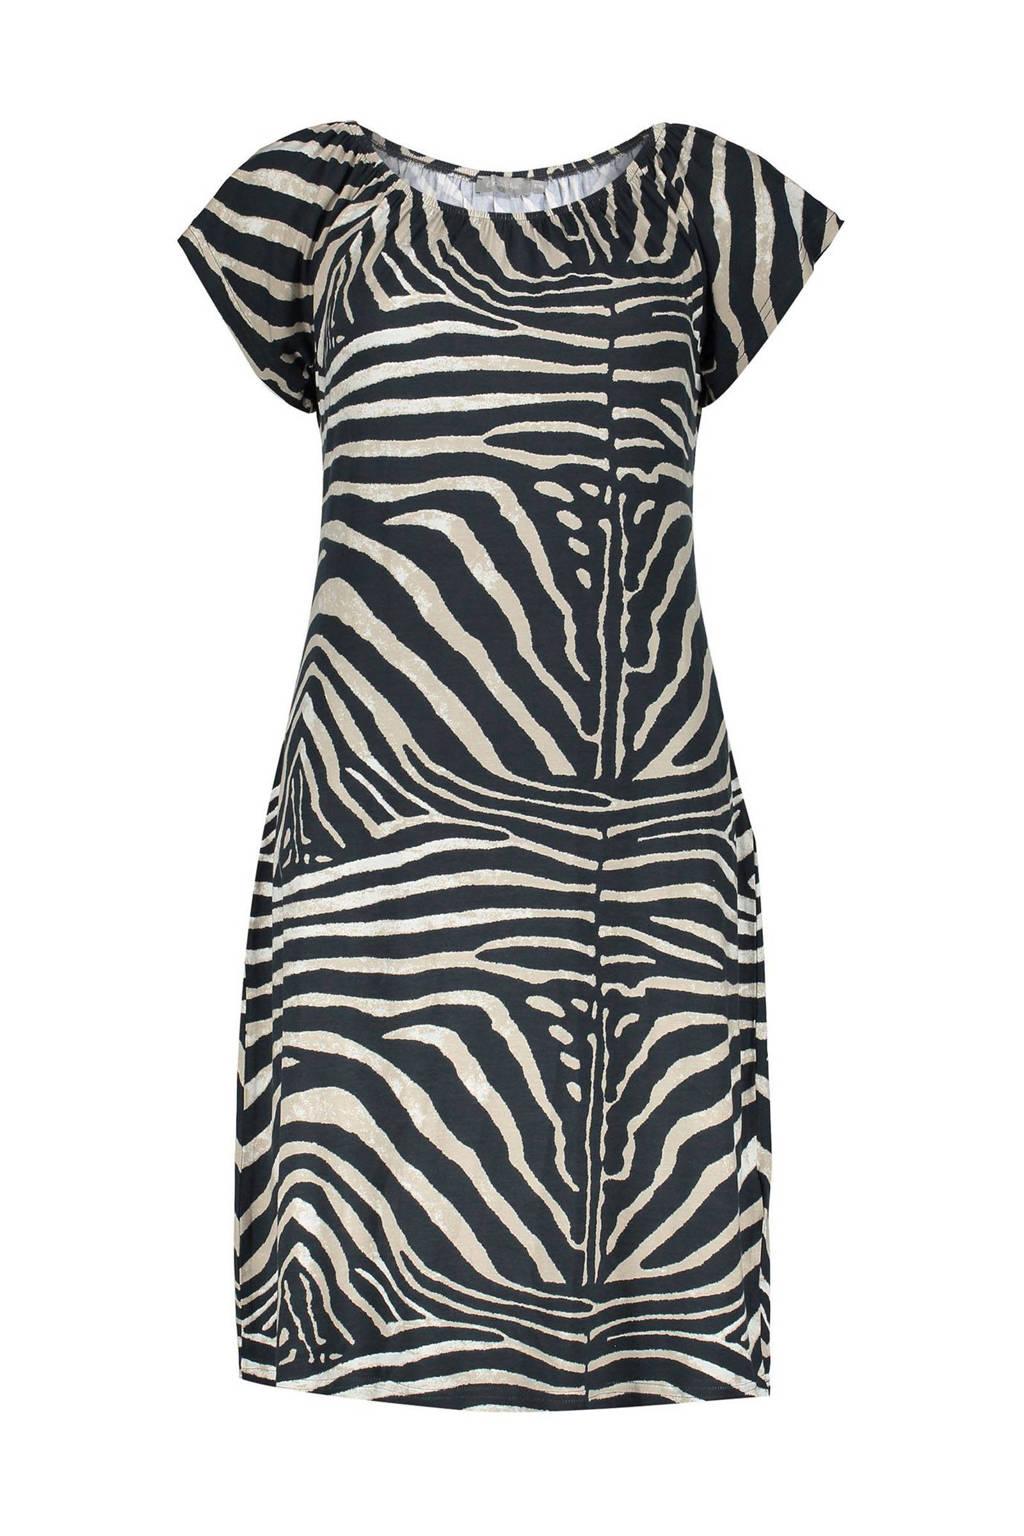 Geisha jersey jurk met zebraprint zwart/beige, Zwart/beige